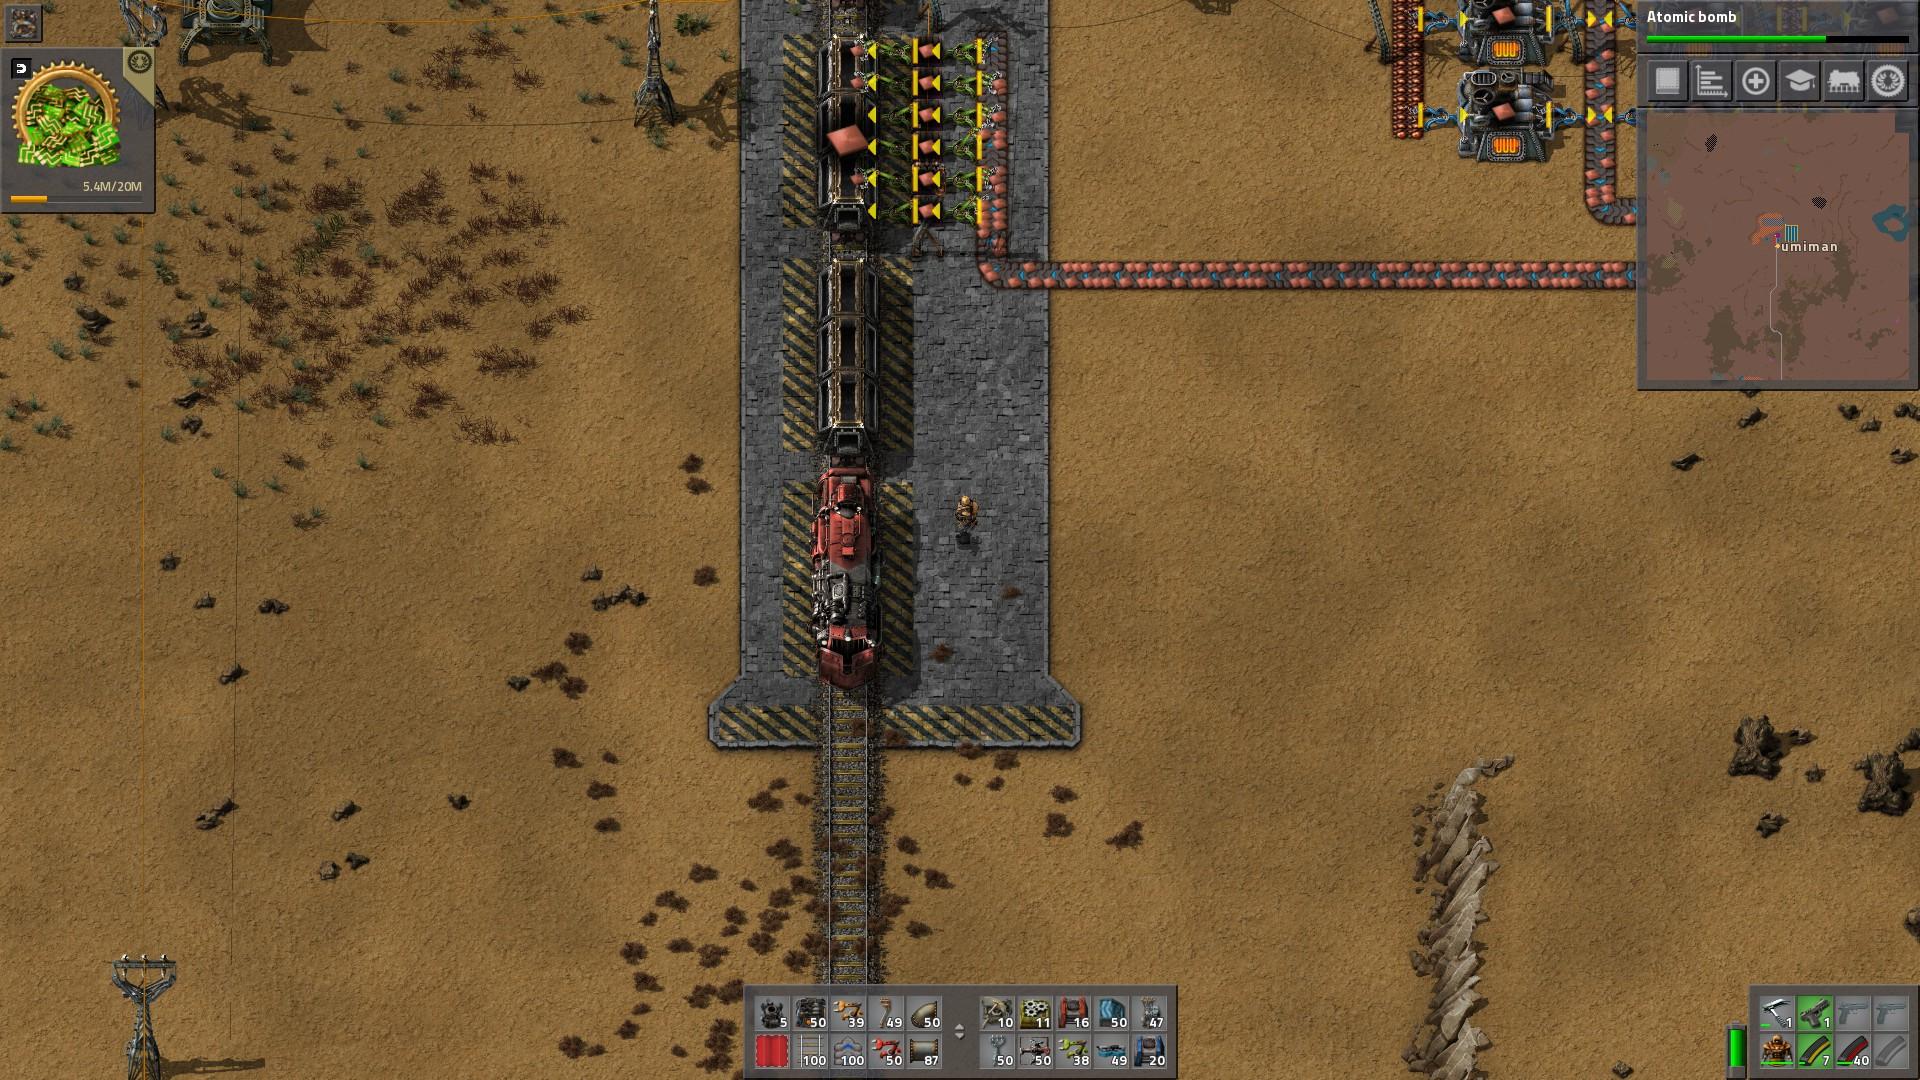 Factorio - Factory building game